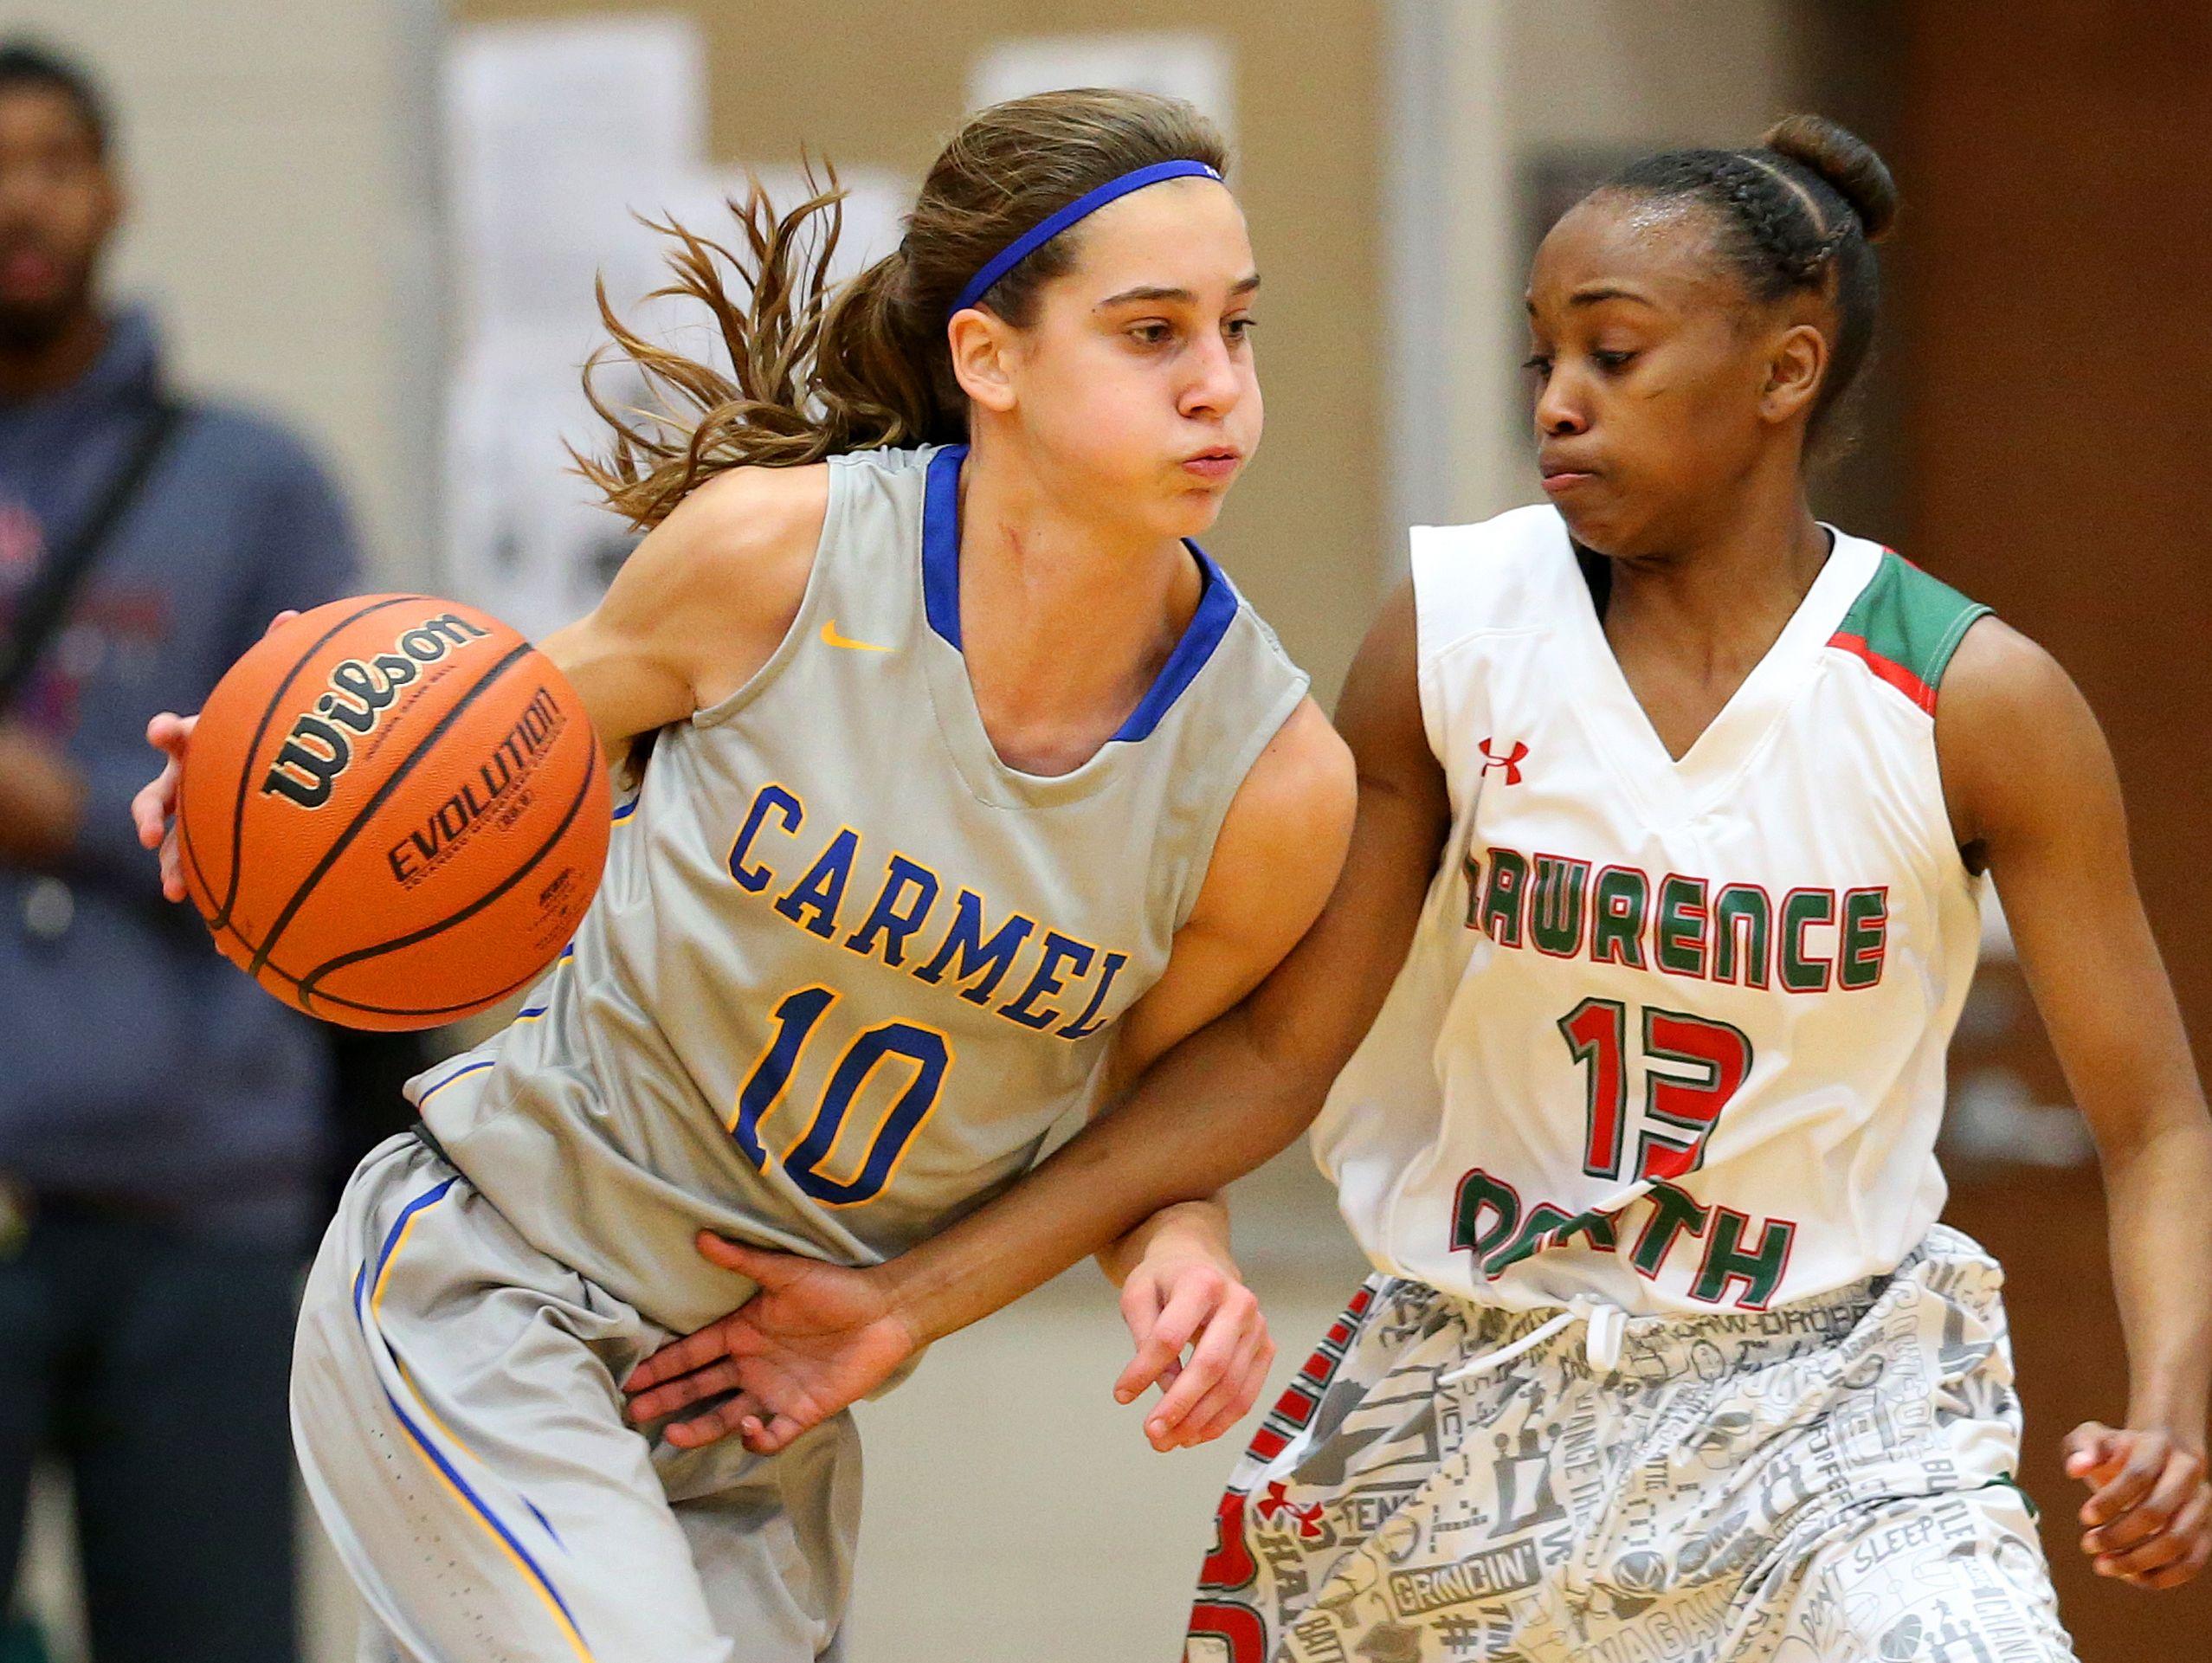 Lawrence NorthÕs Lauren Dickerson (13) defends against CarmelÕs Amy Dilk (10) on Dec. 1, 2015.